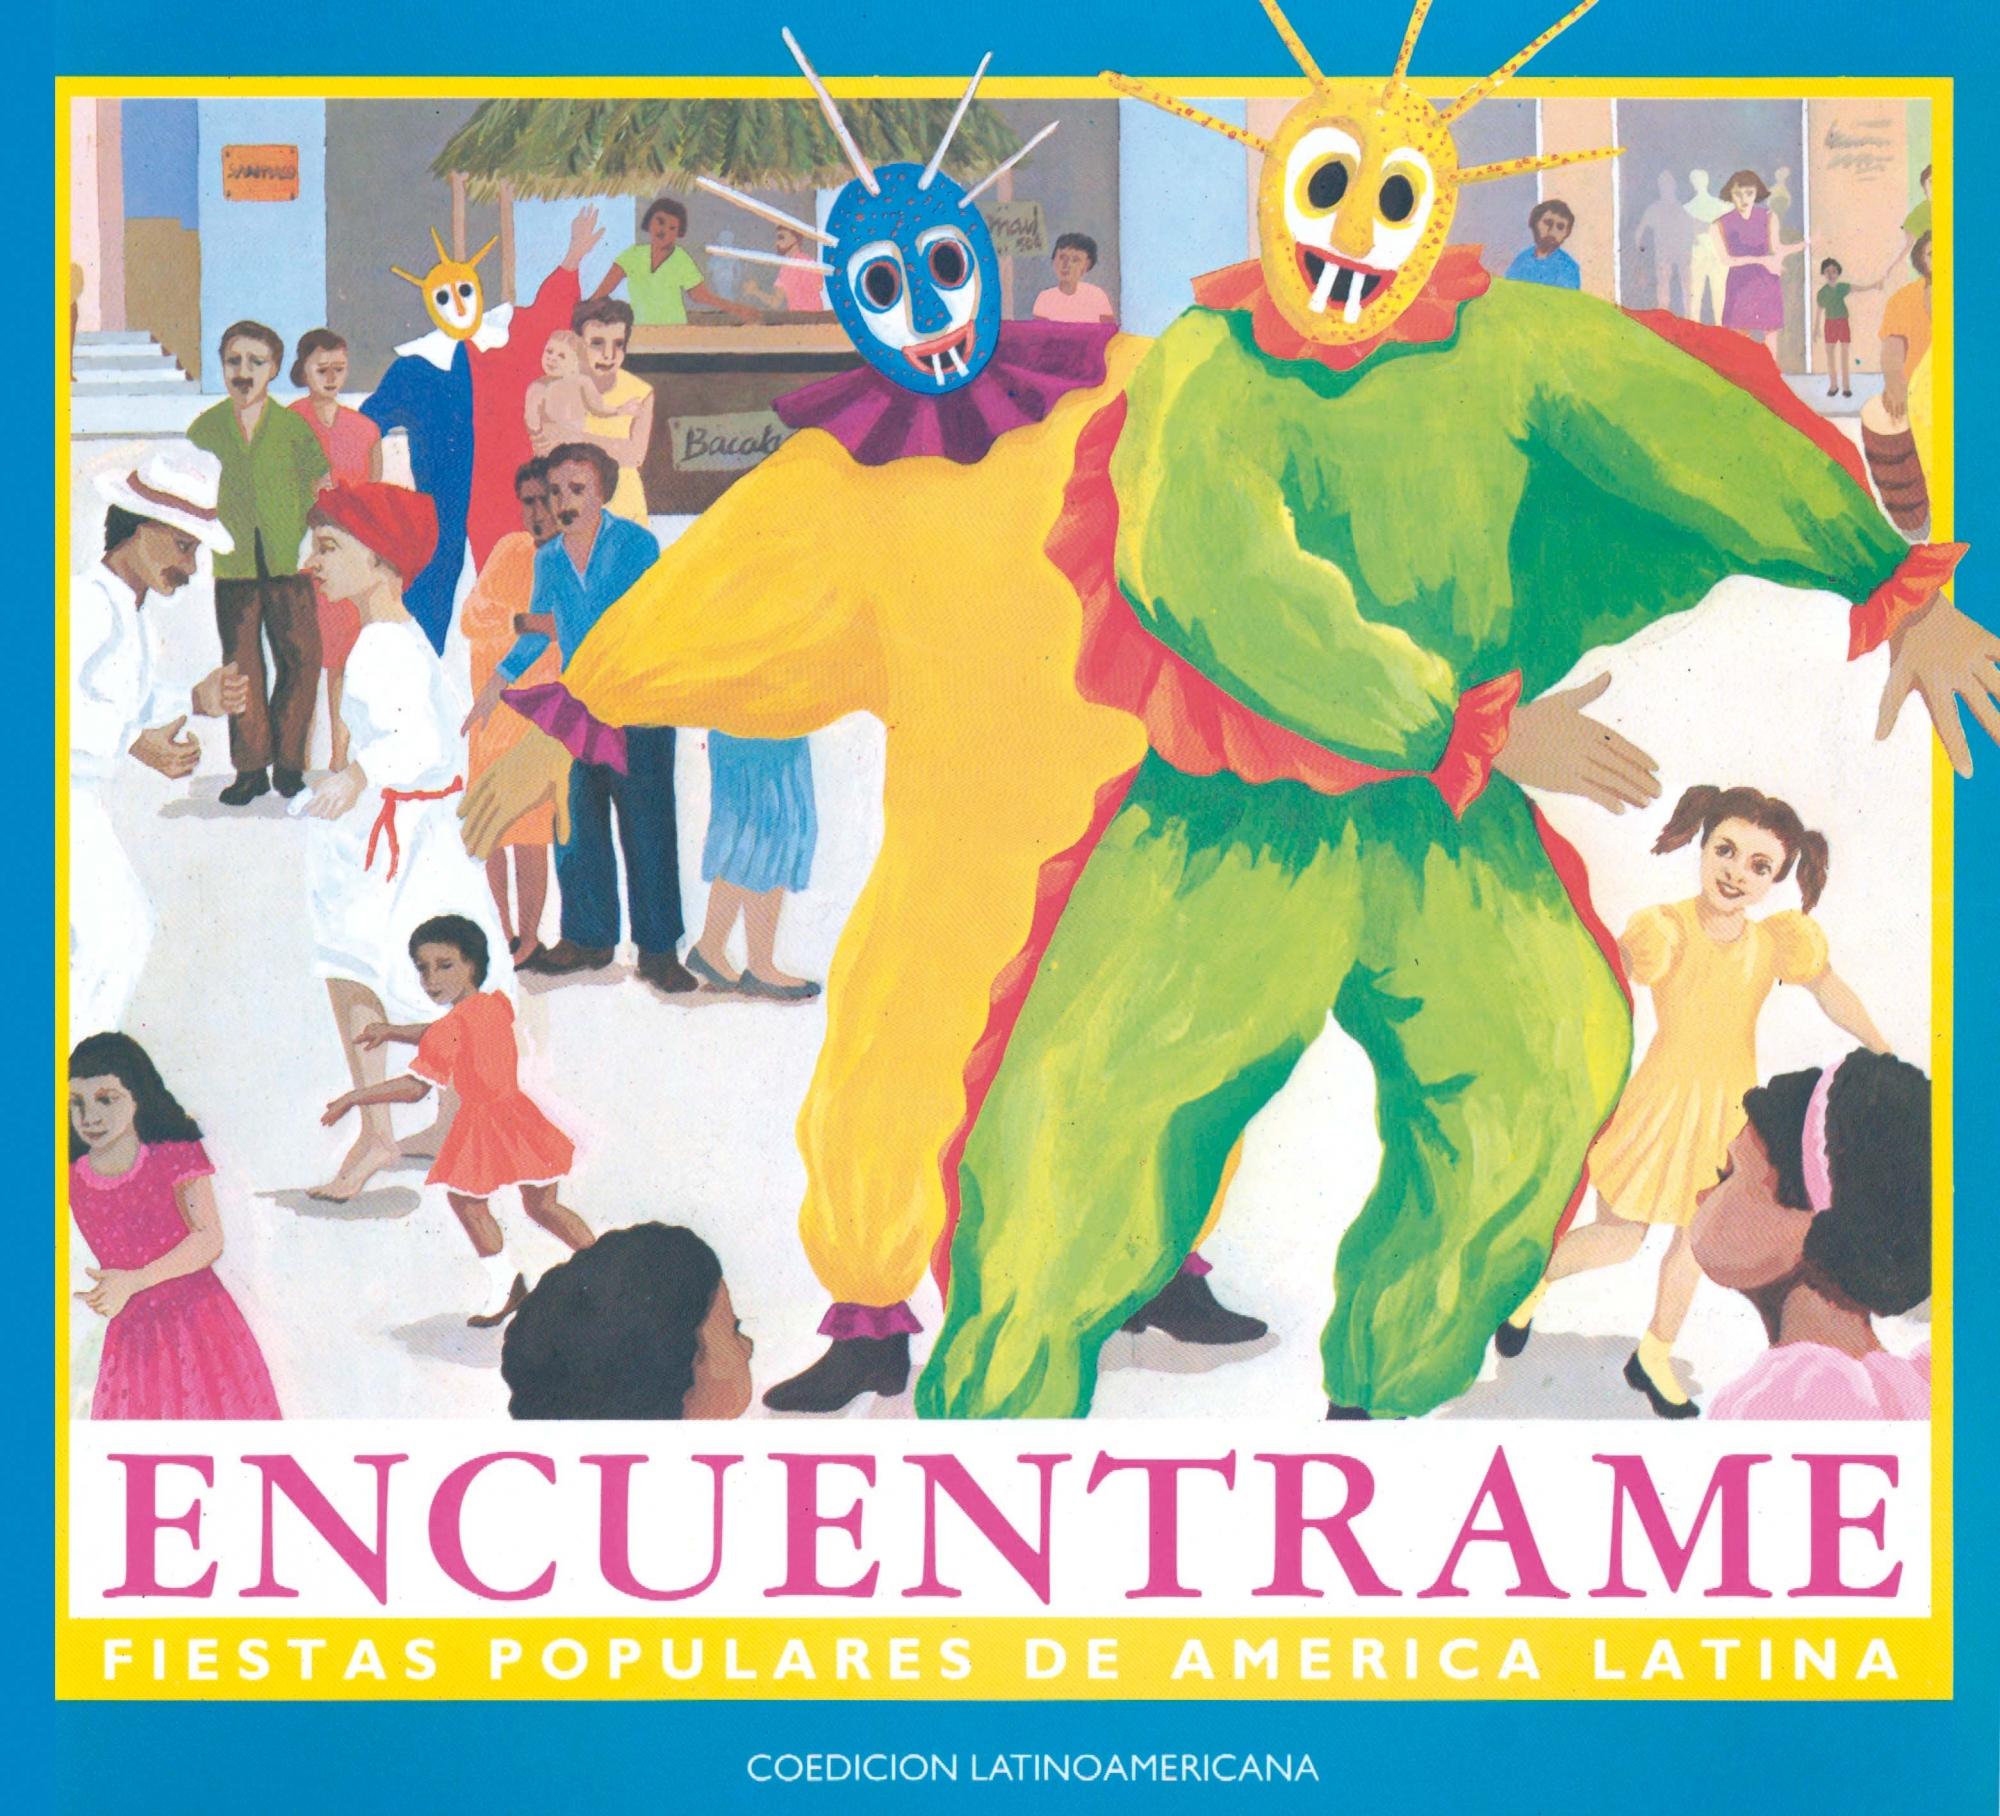 ENCUÉNTRAME. Fiestas populares de América Latina